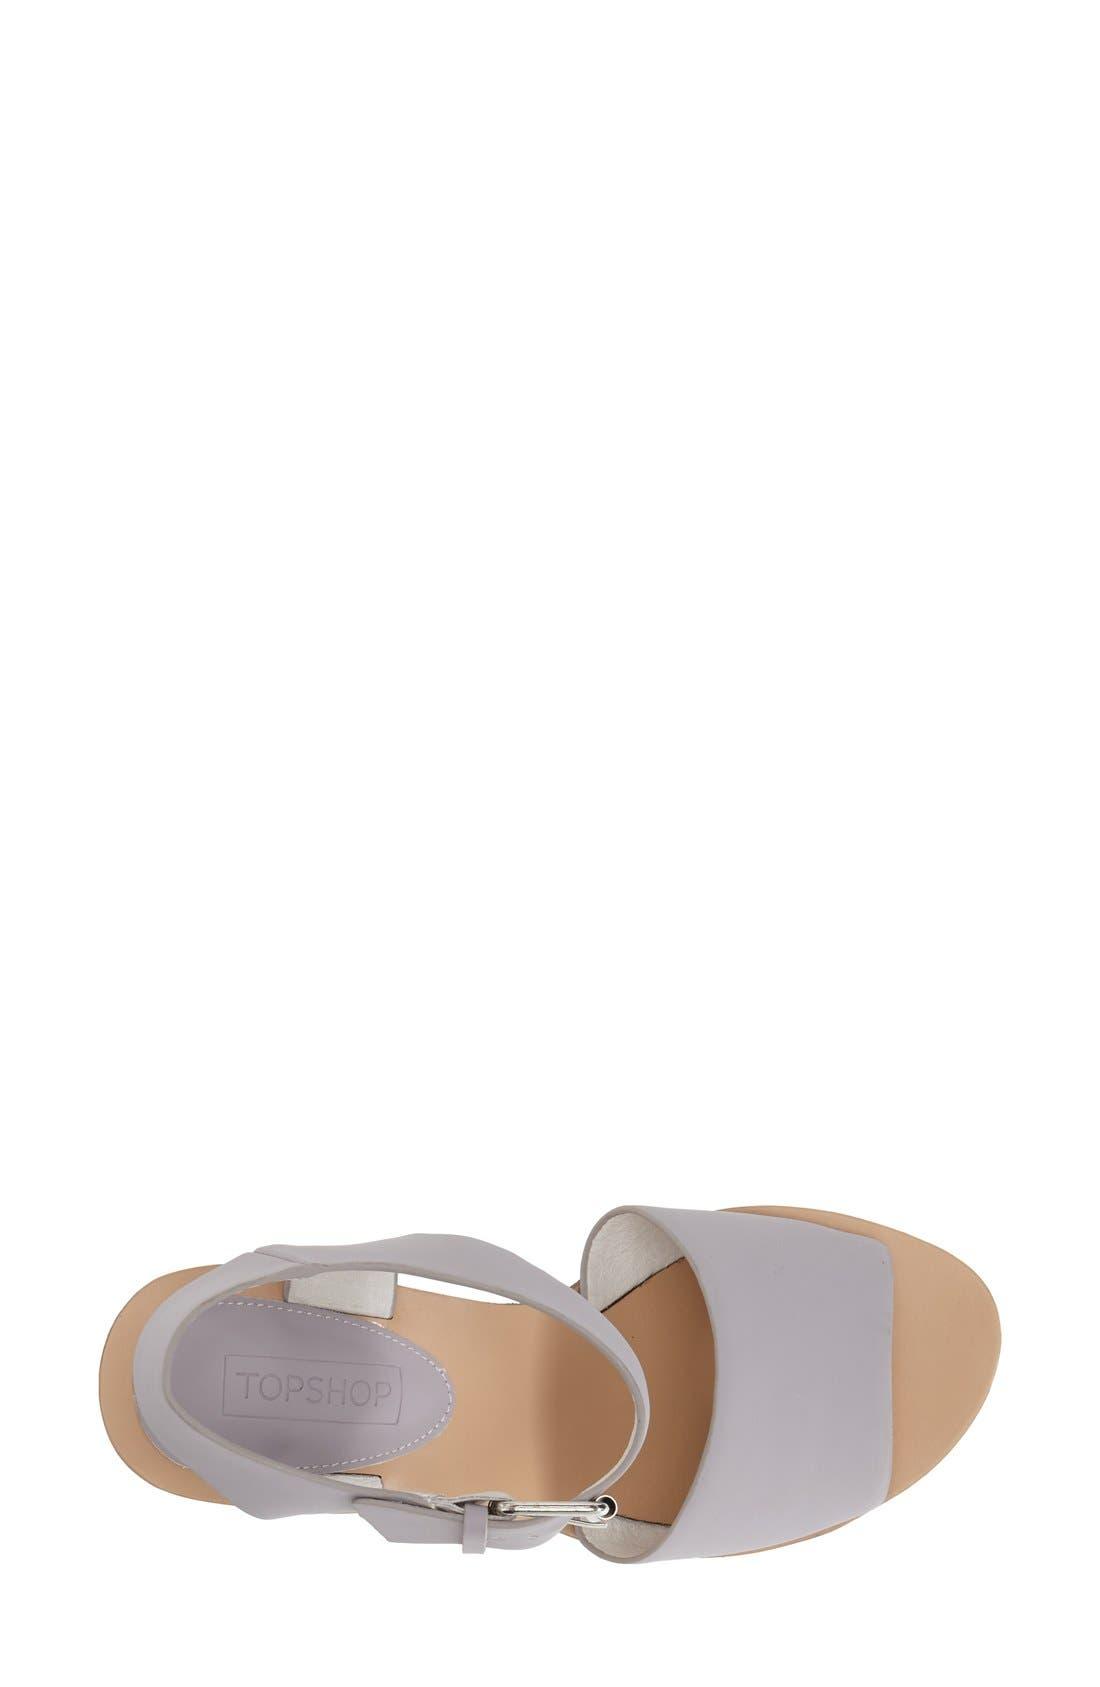 Alternate Image 3  - Topshop 'Wedding' Wedge Sandal (Women)